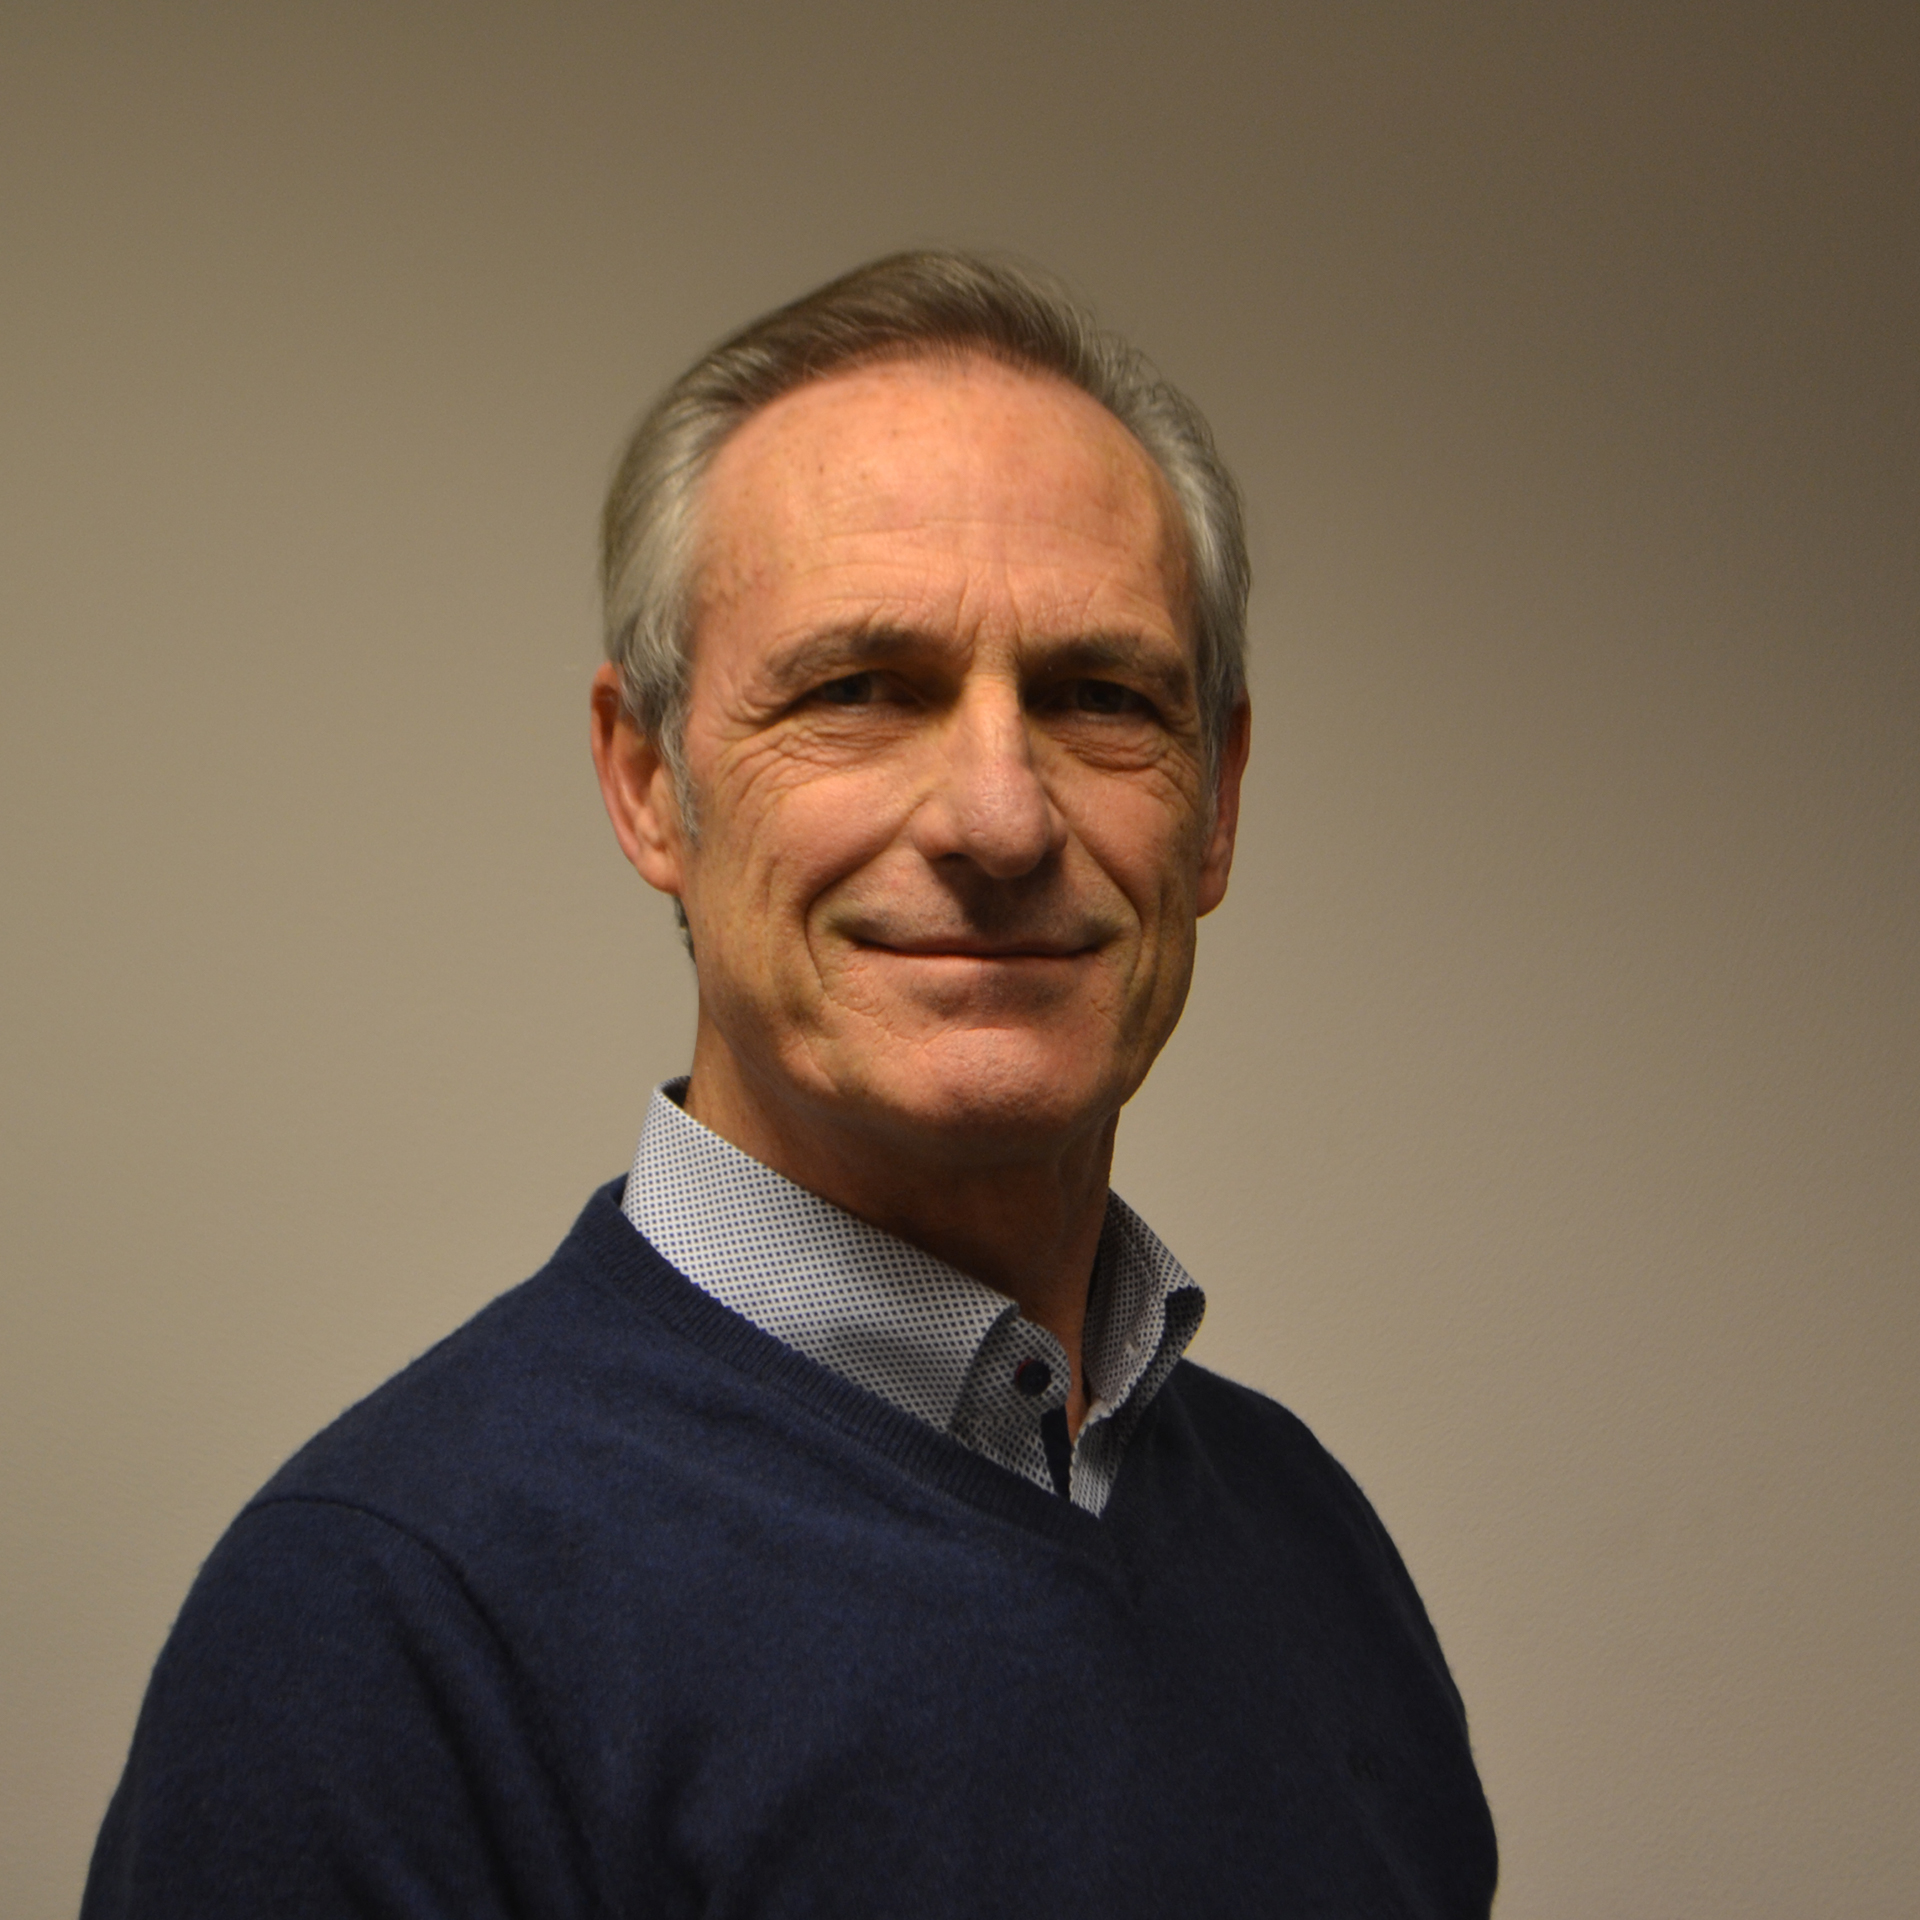 Dr. Roger Renders